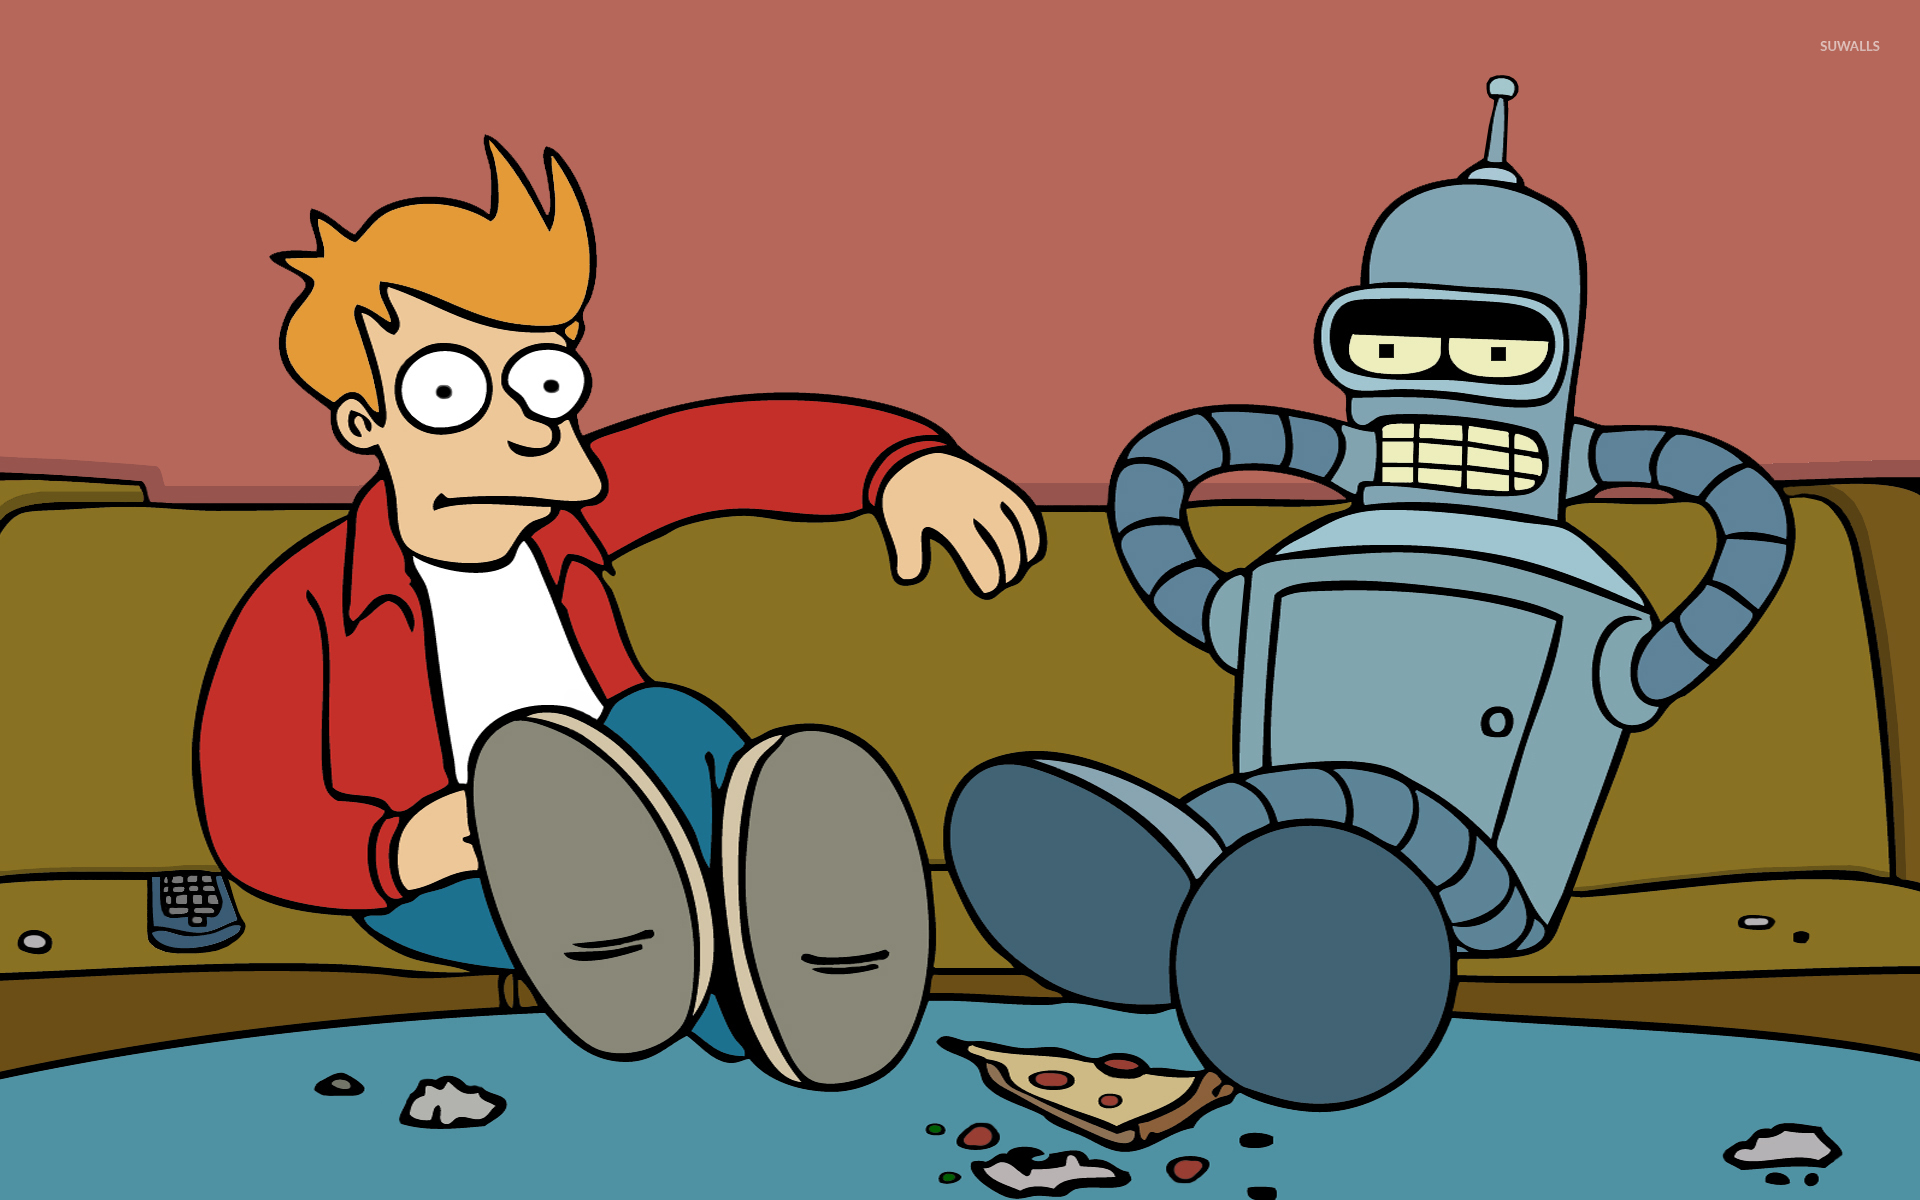 Fry and Bender - Futurama wallpaper